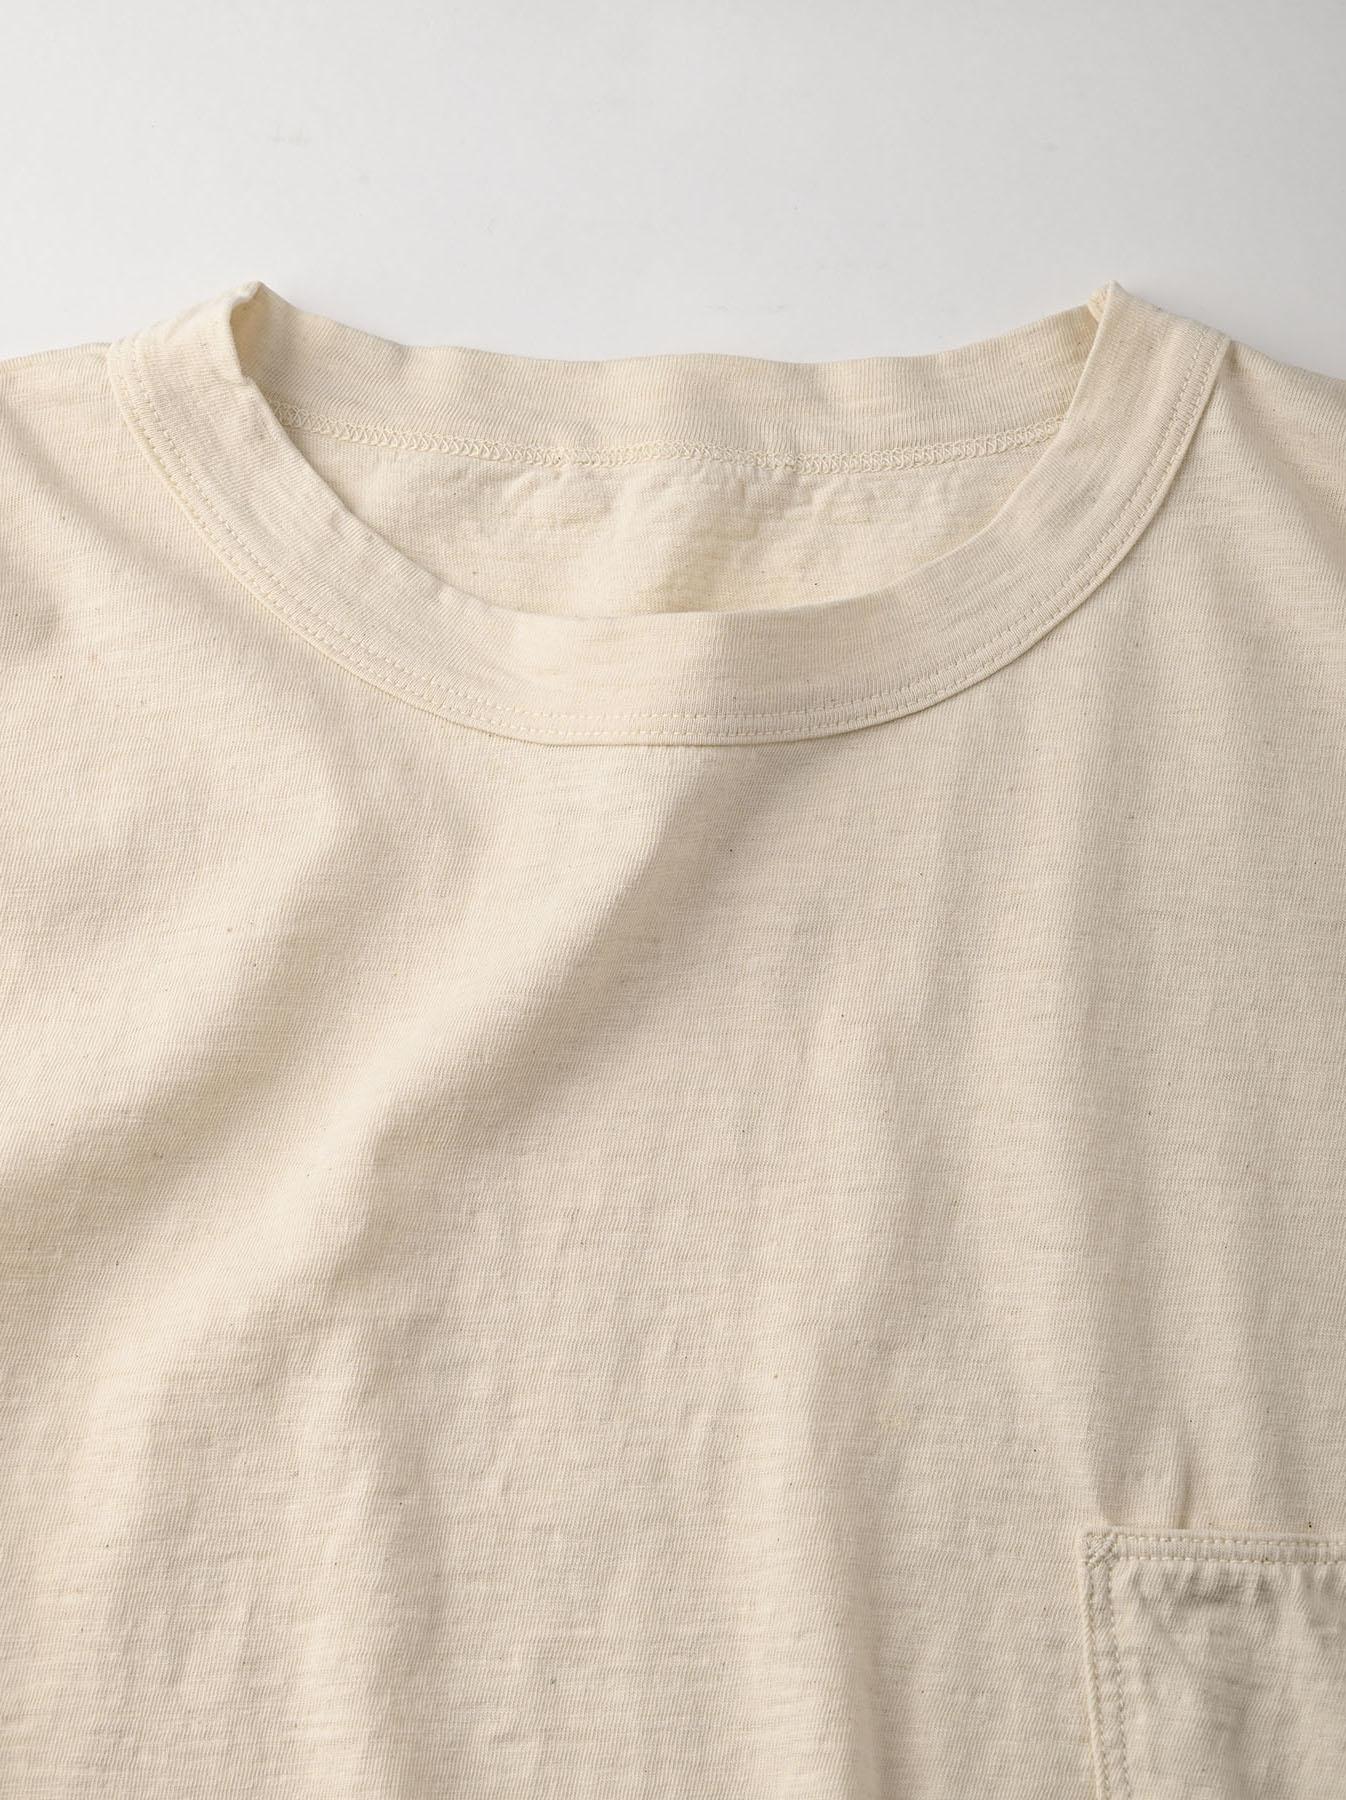 Hayama-kun Embroidered 908 Ocean T-shirt (0621)-7